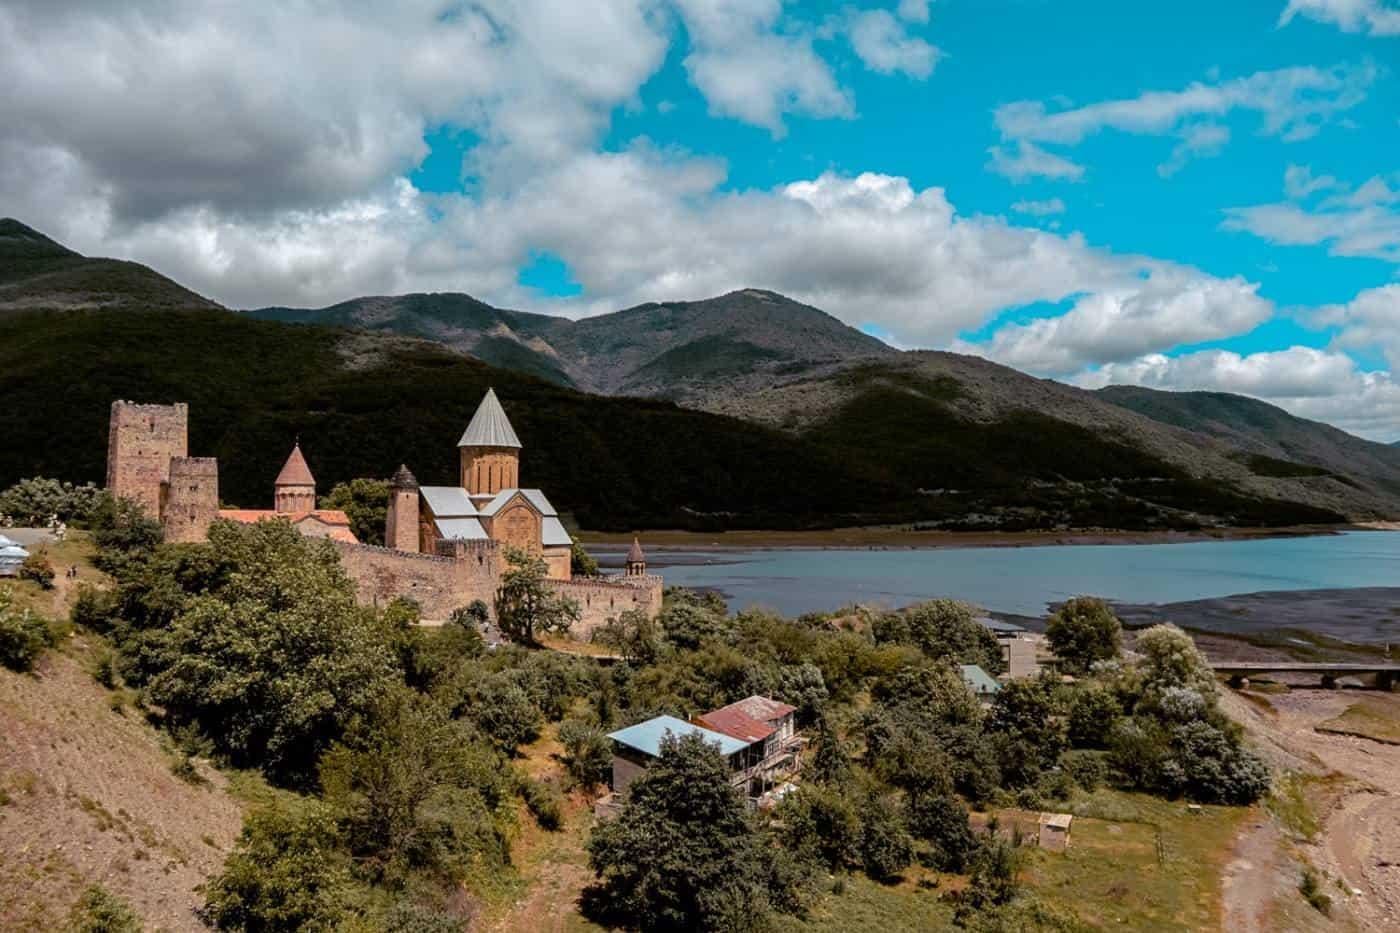 Georgia Roadtrip Anunuri Fortress Kazbegi